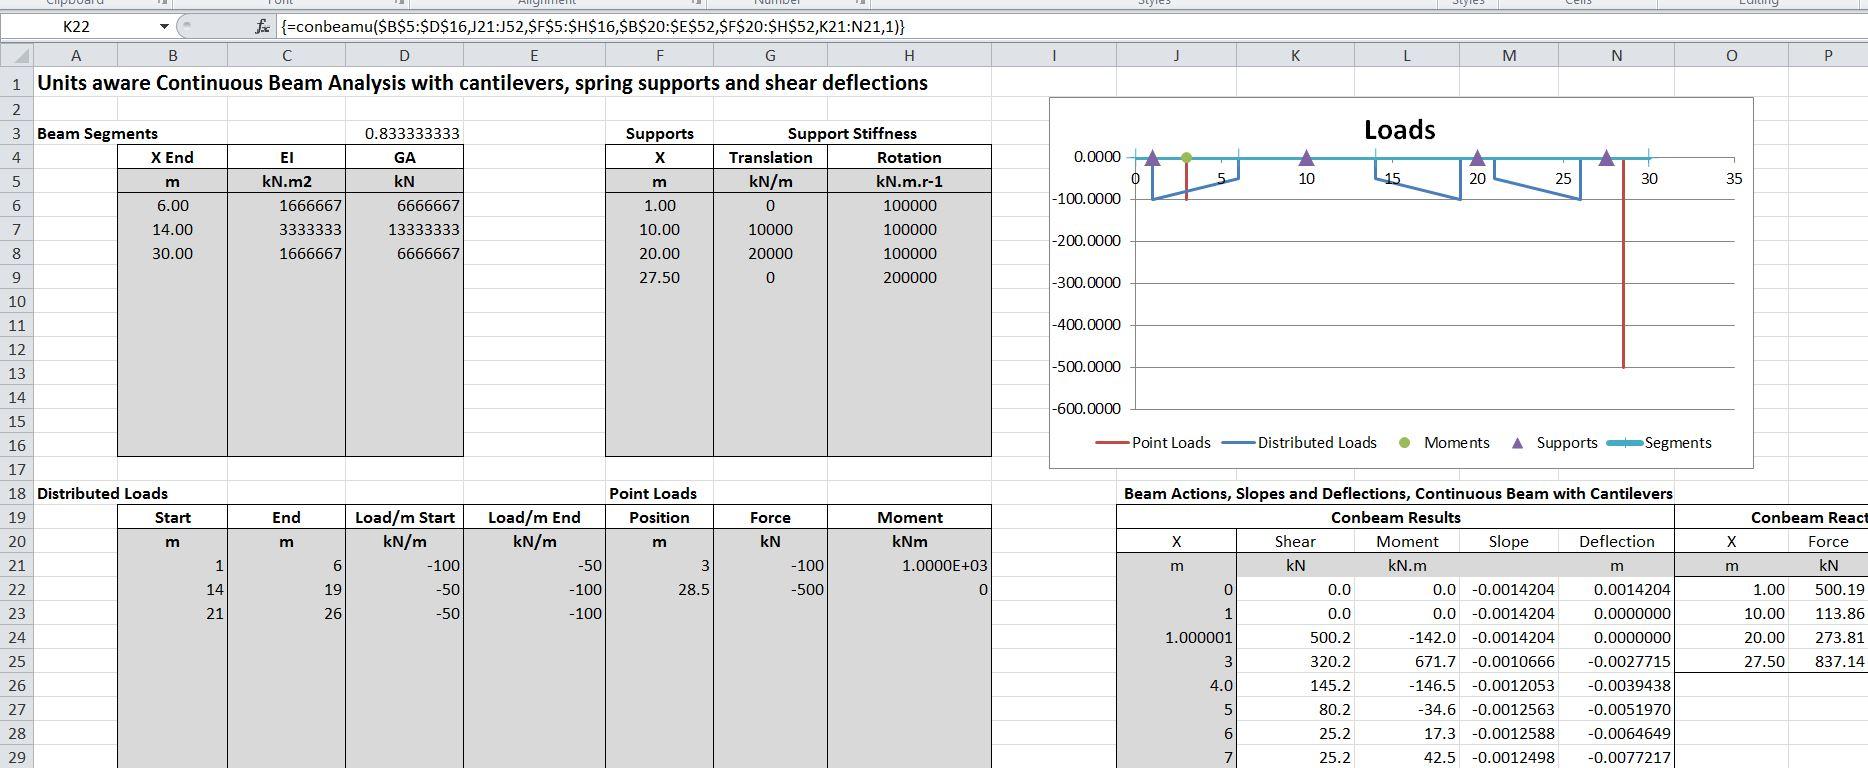 Unit Aware Continuous Beam Spreadsheet Update